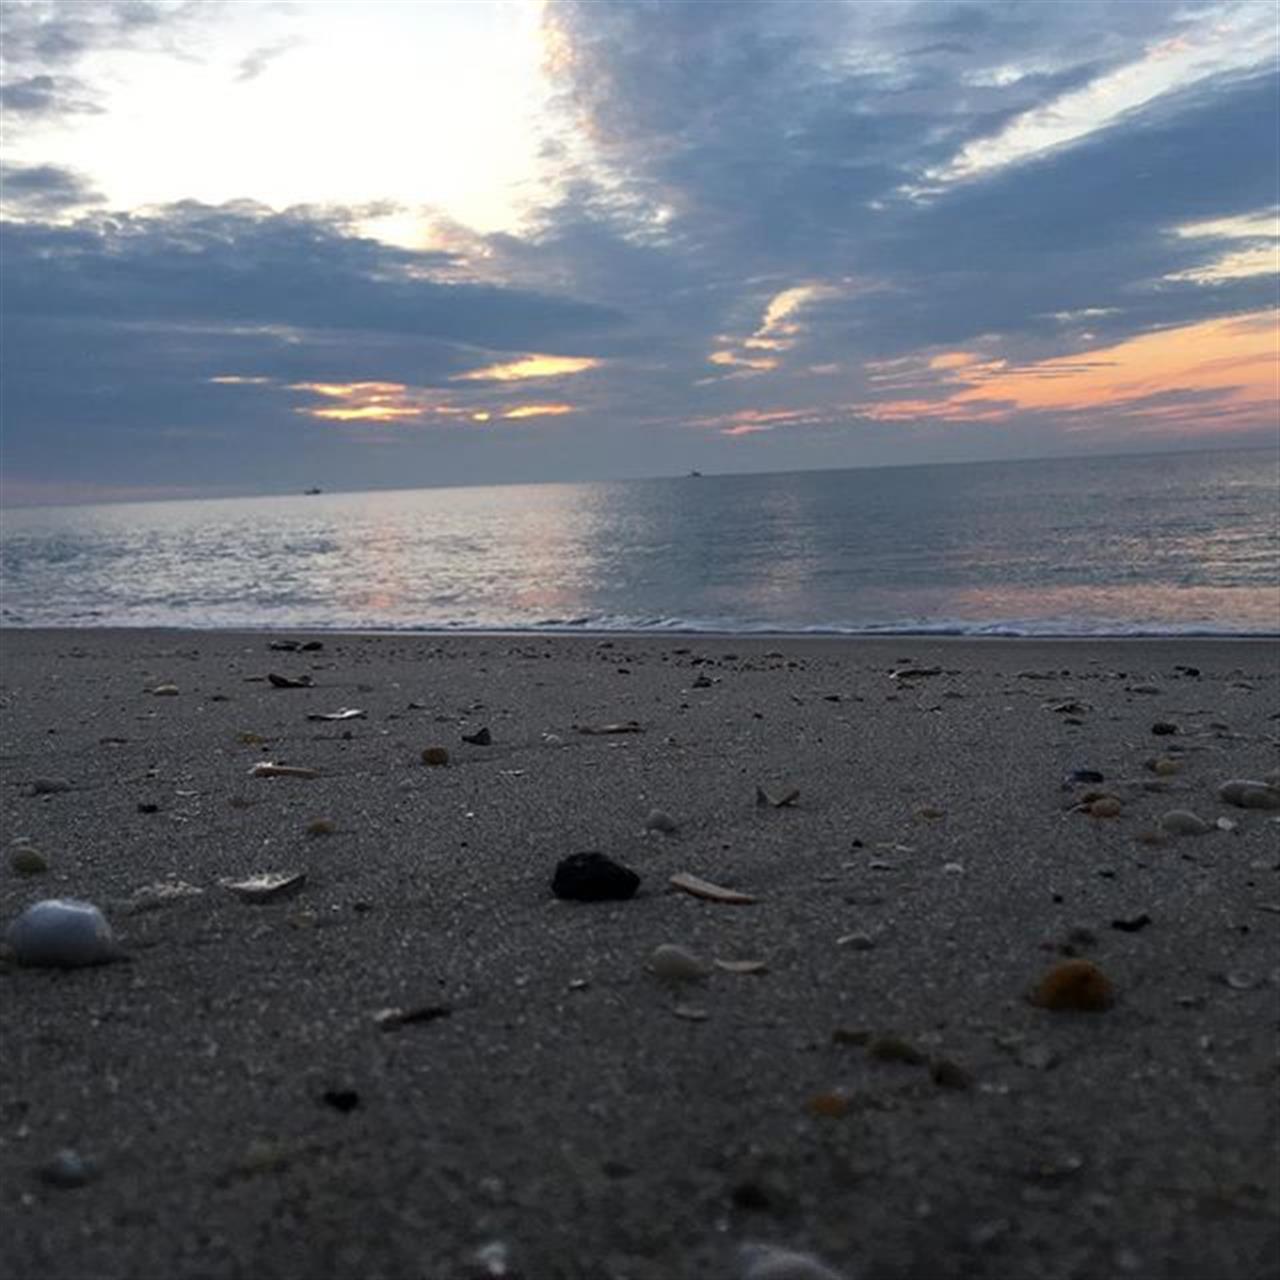 A nice sunrise in Bay Head... #bayhead #nj #sunrise #goodmorning #leadingrelocal #ilovebayhead